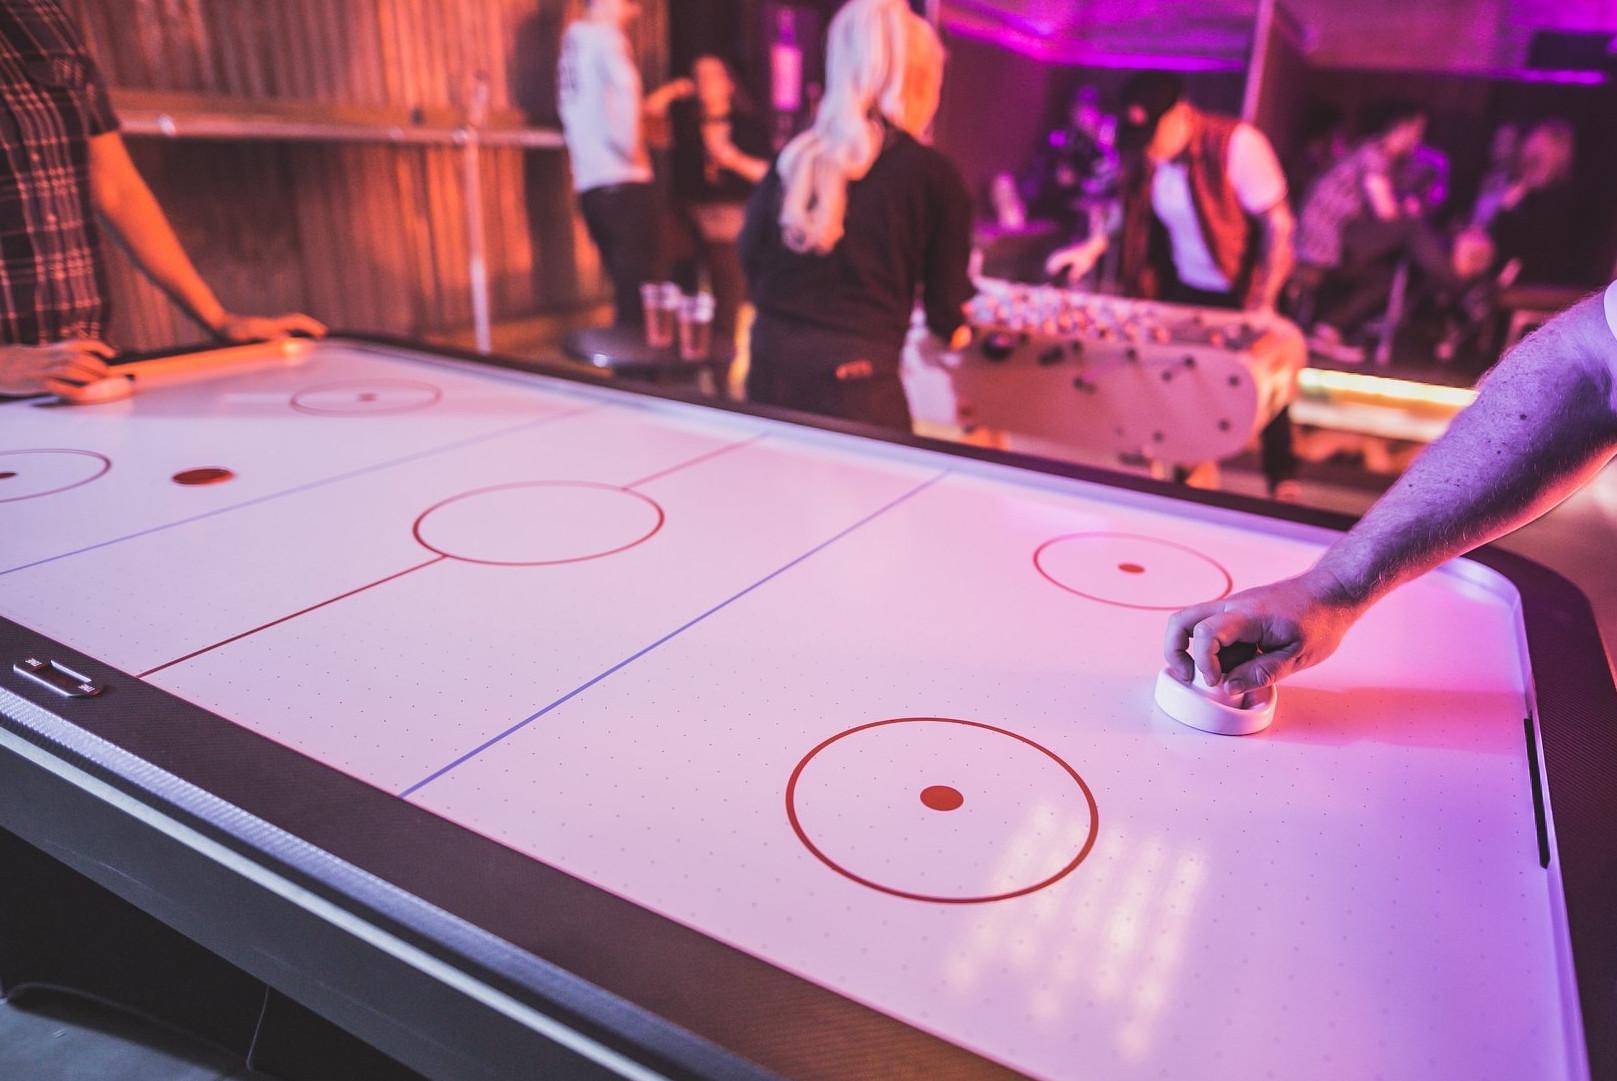 Air Hockey Table Hire Interactive Games Hire Jm Entertainment Uk